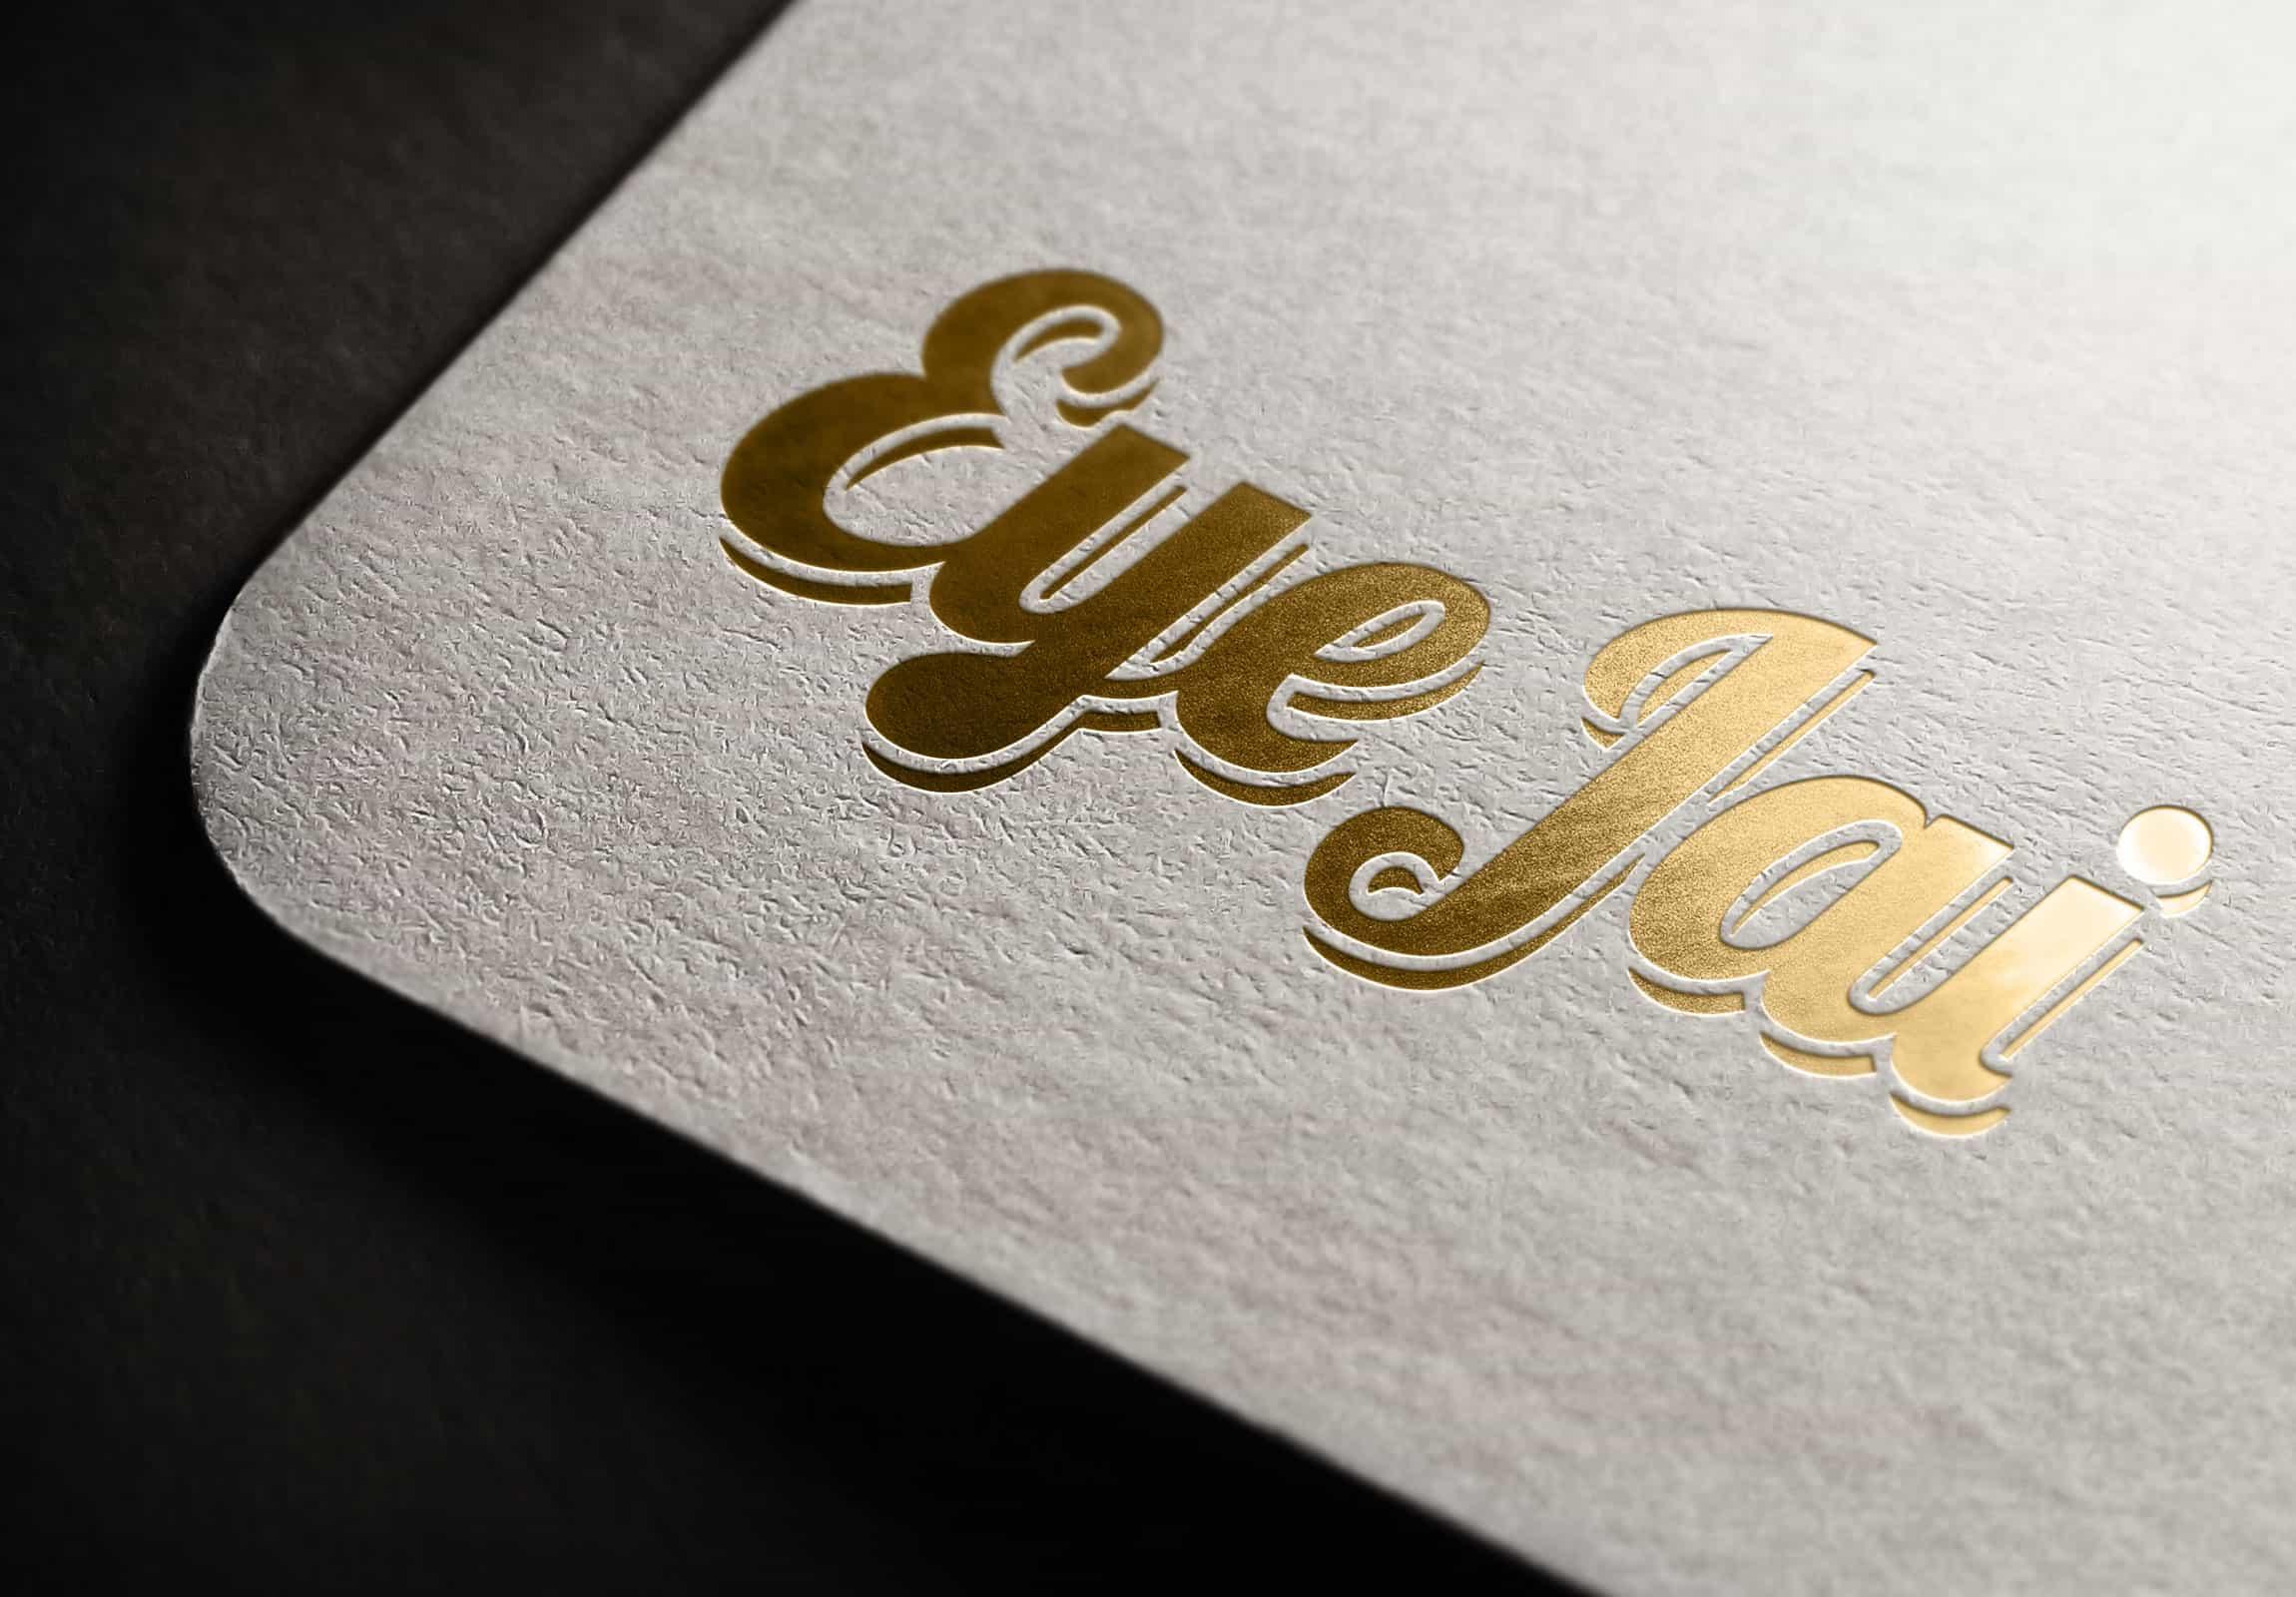 EyeJai - Branding & Marketing